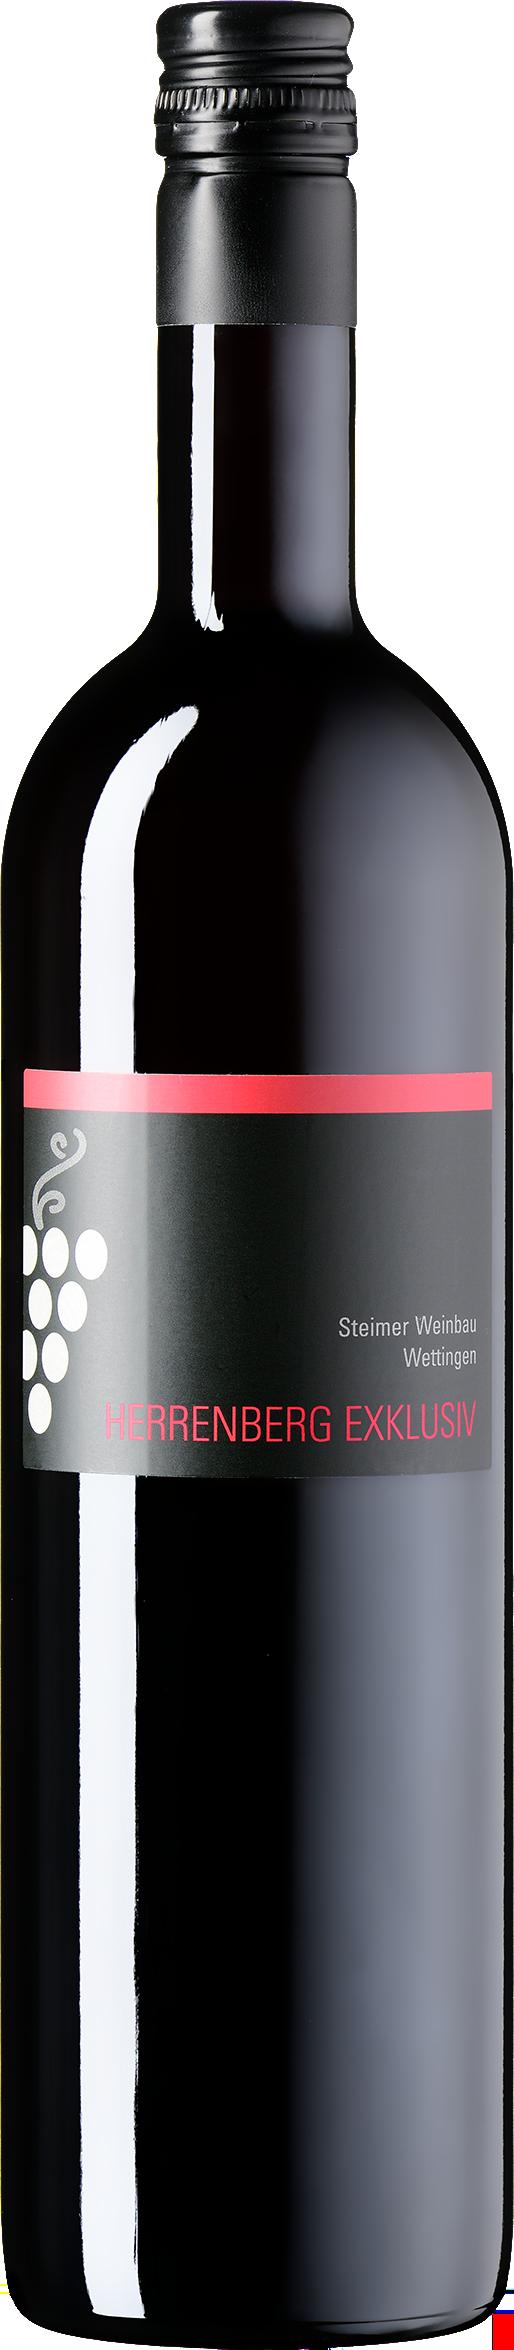 Herrenberg Exklusiv